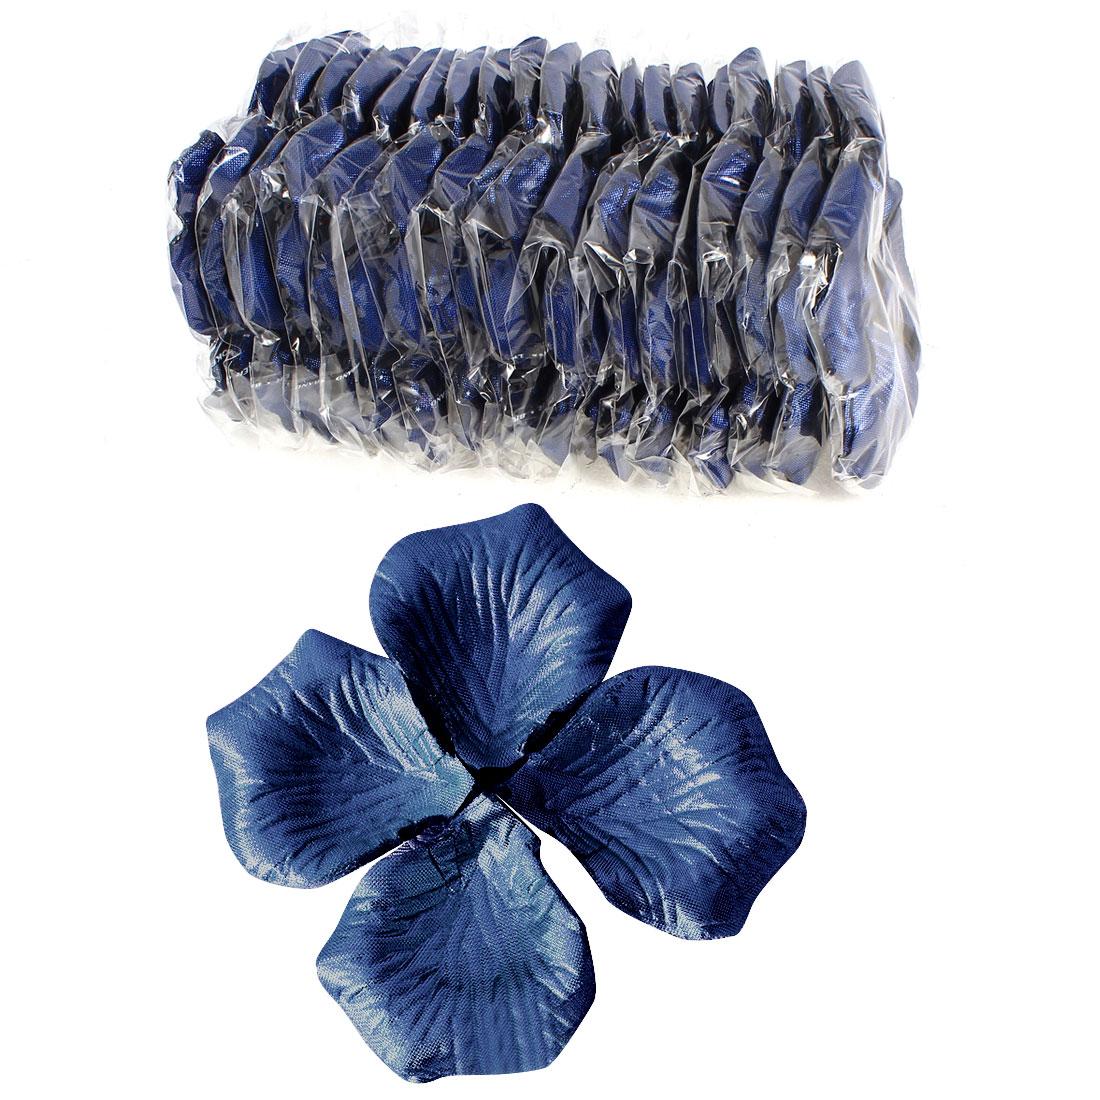 1000 Pcs Royal Blue Artificial Silk Flower Rose Petals Wedding Bridal Party Decorations